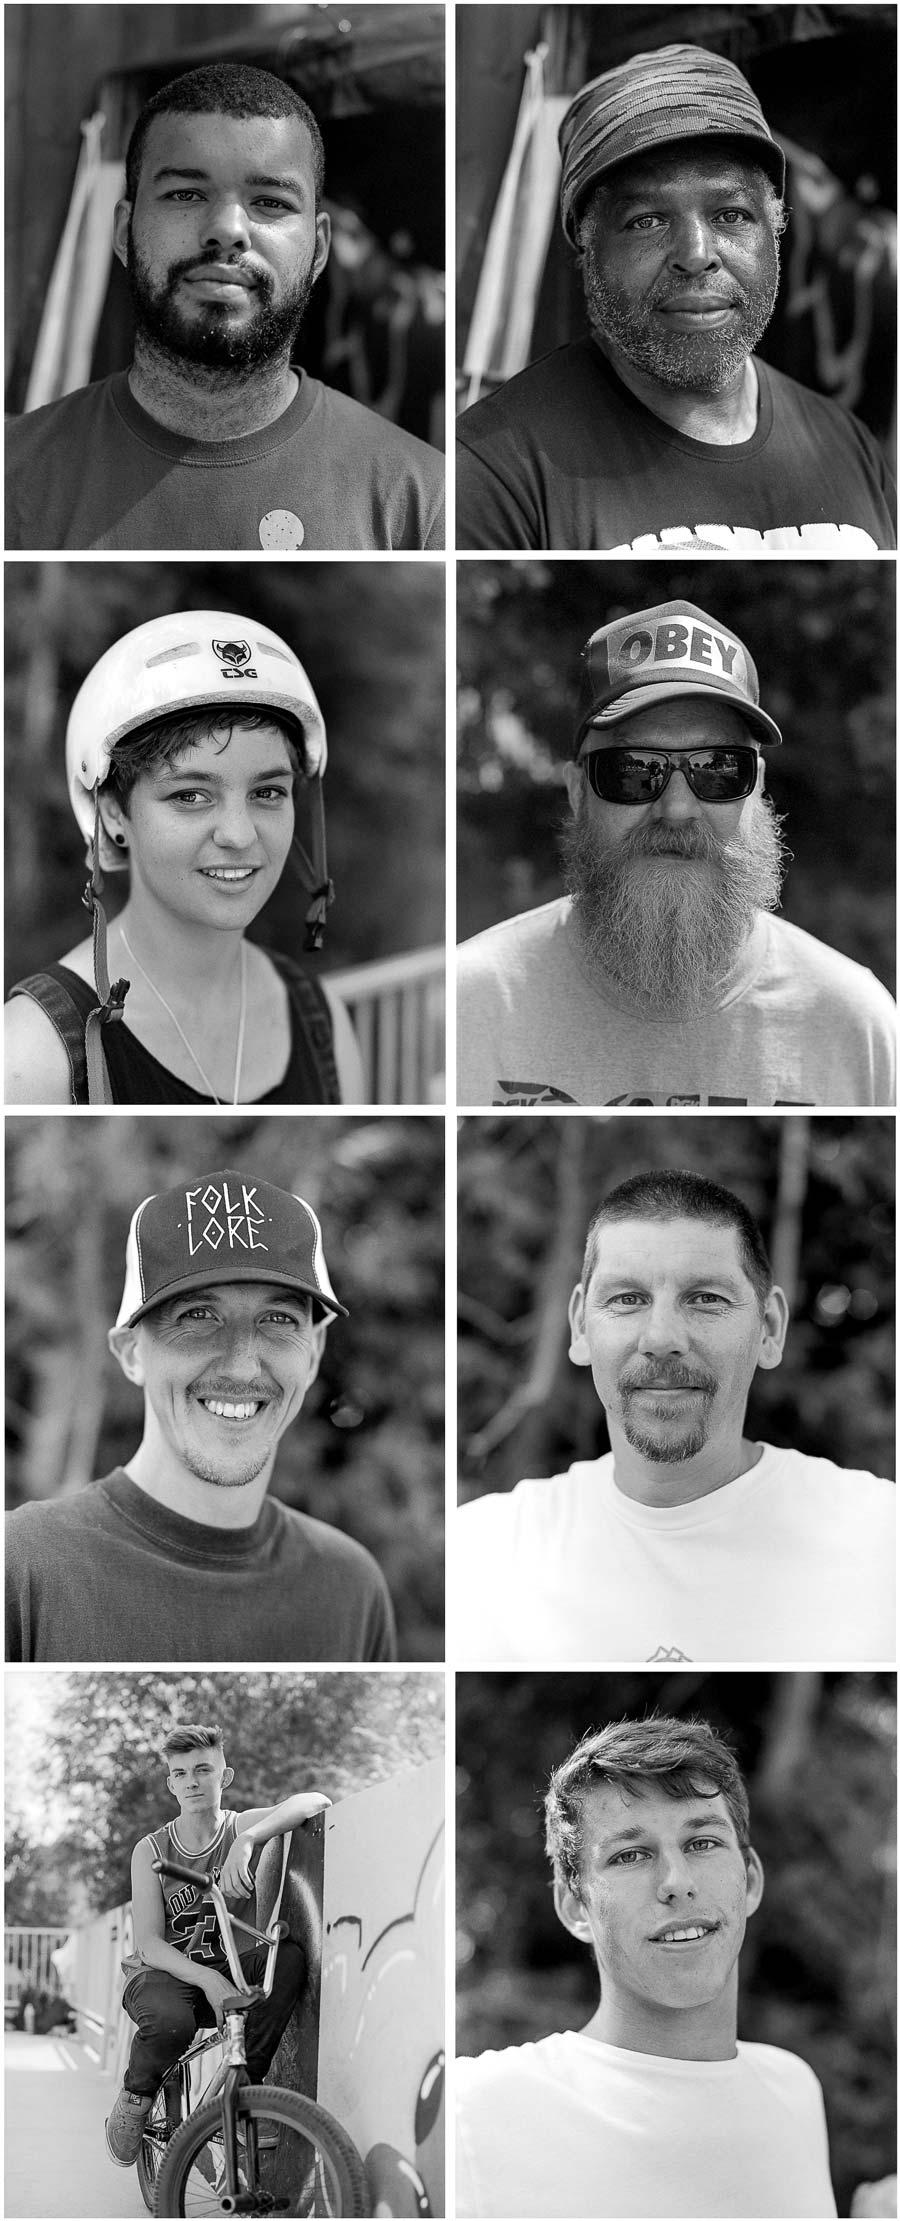 BMX jam portraits